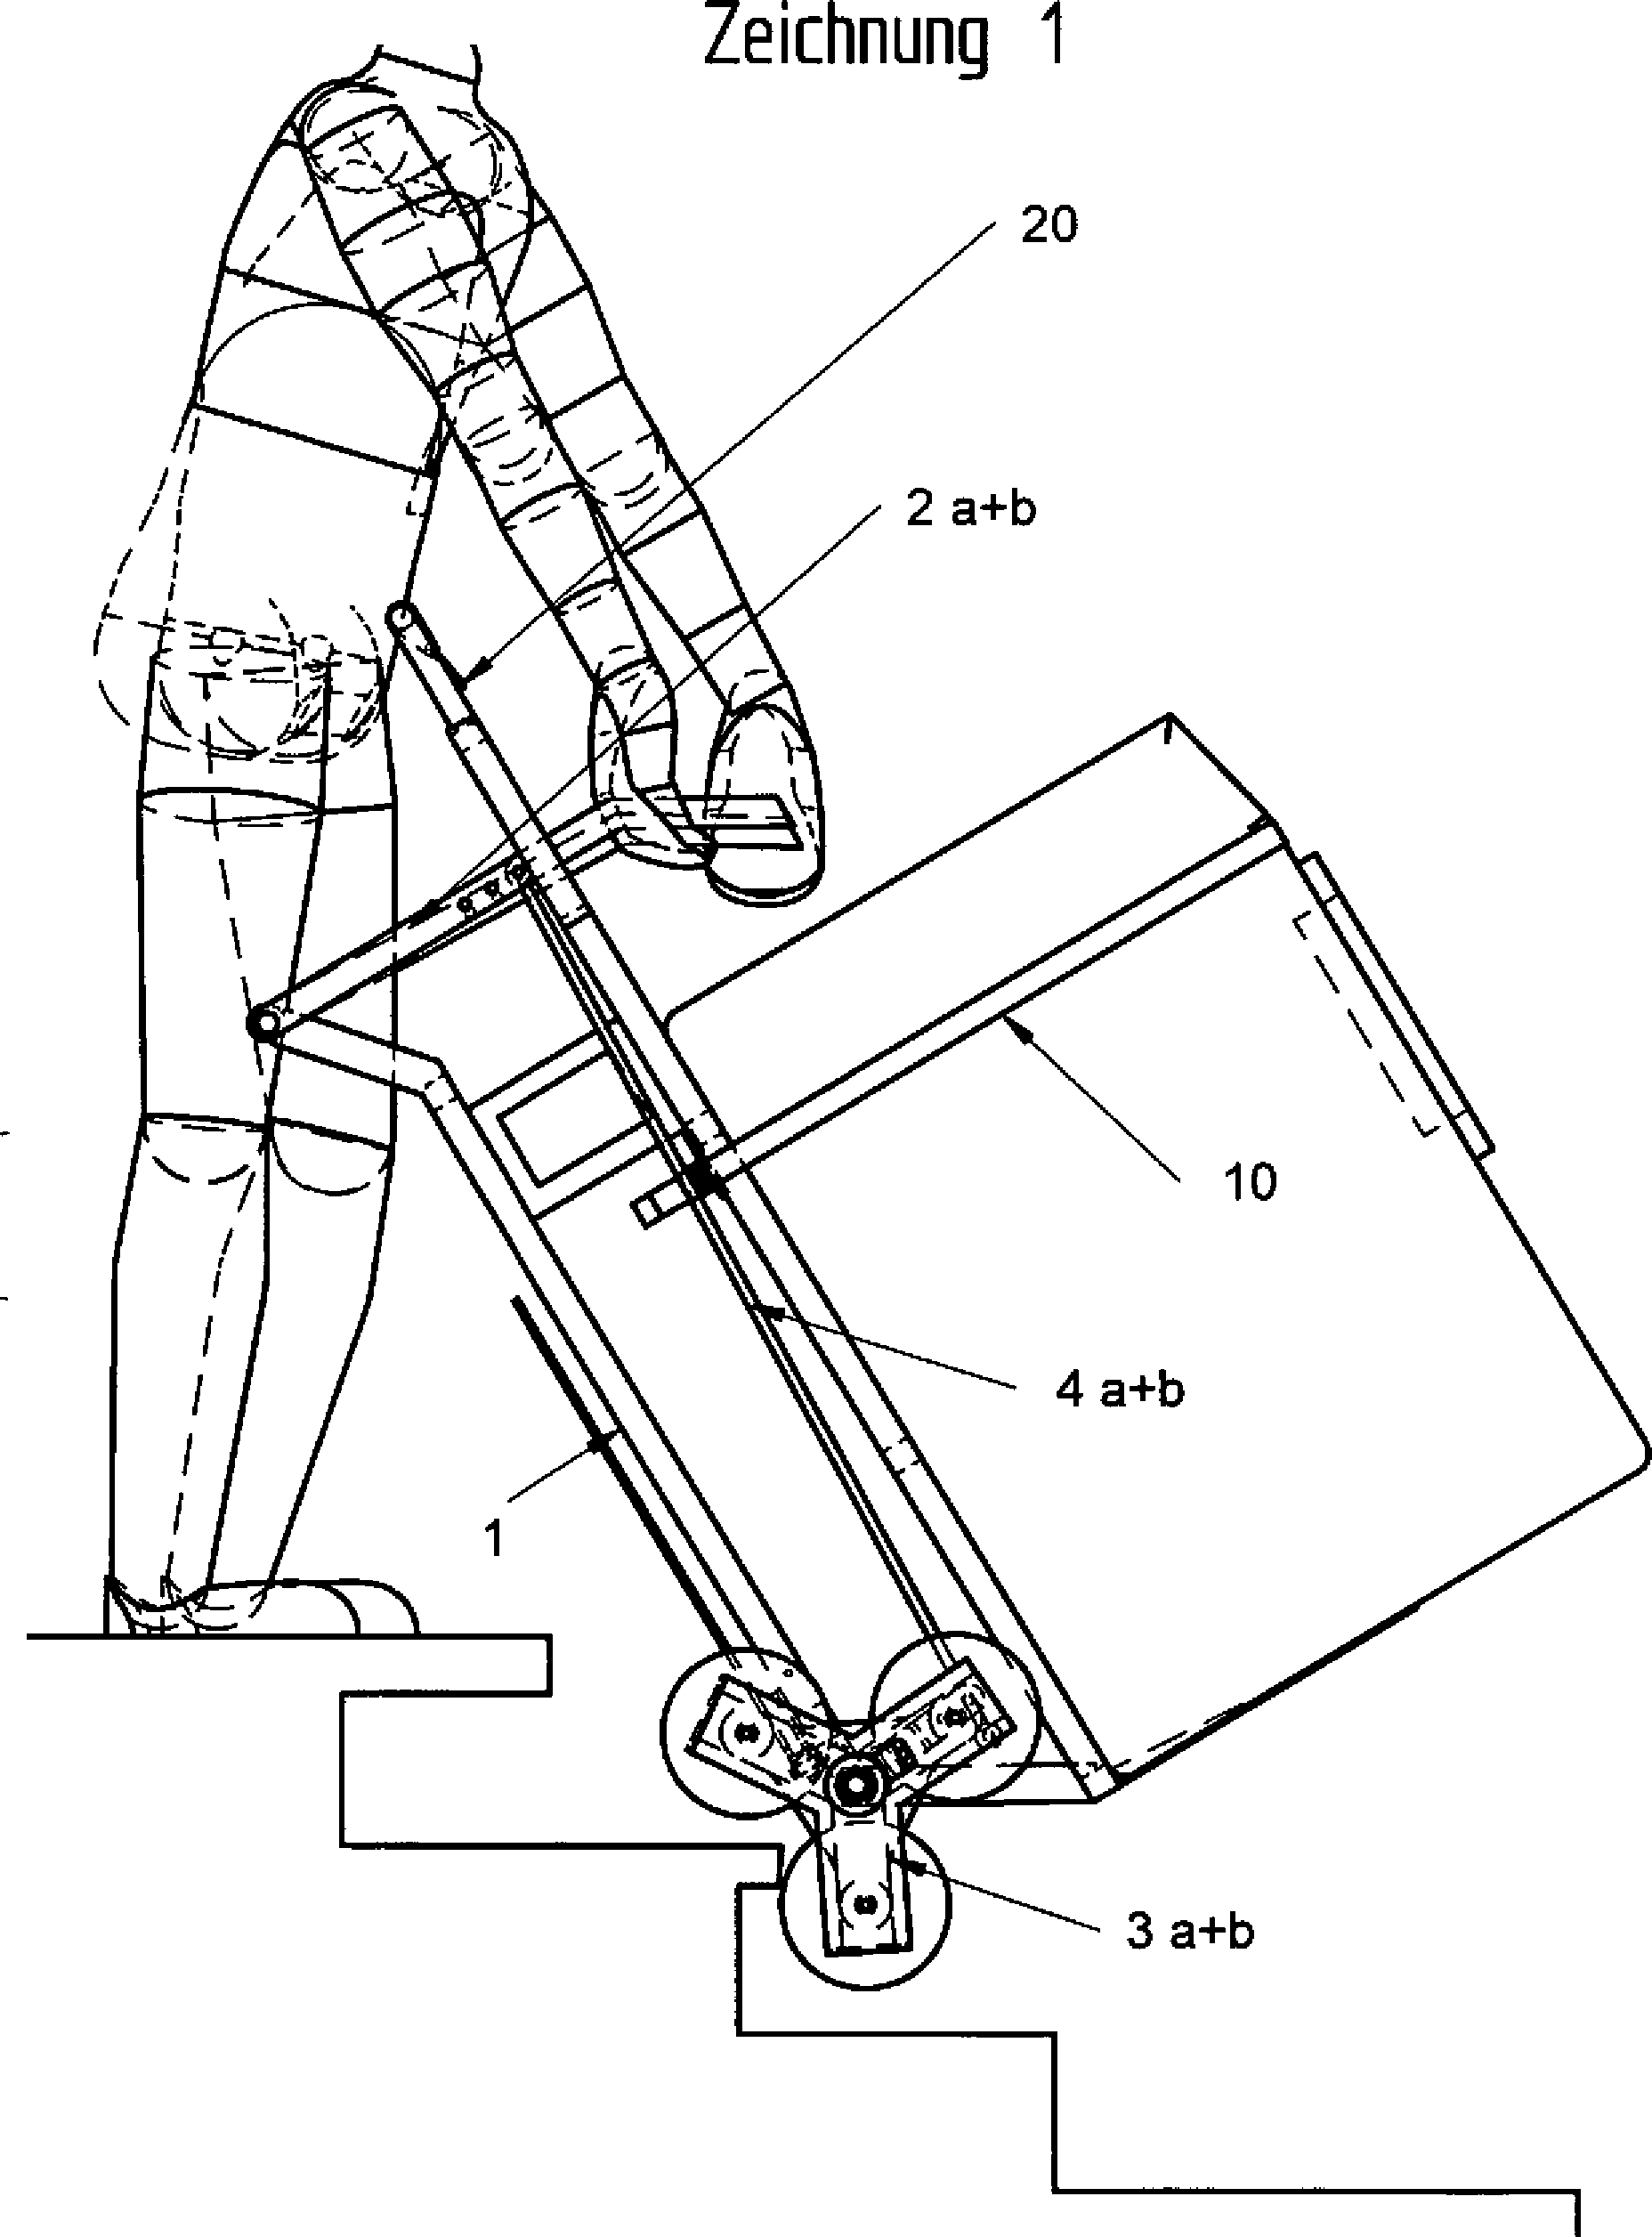 ratschen auto electrical wiring diagram Subaru Baja Wiring Diagram patent de202011106720u1